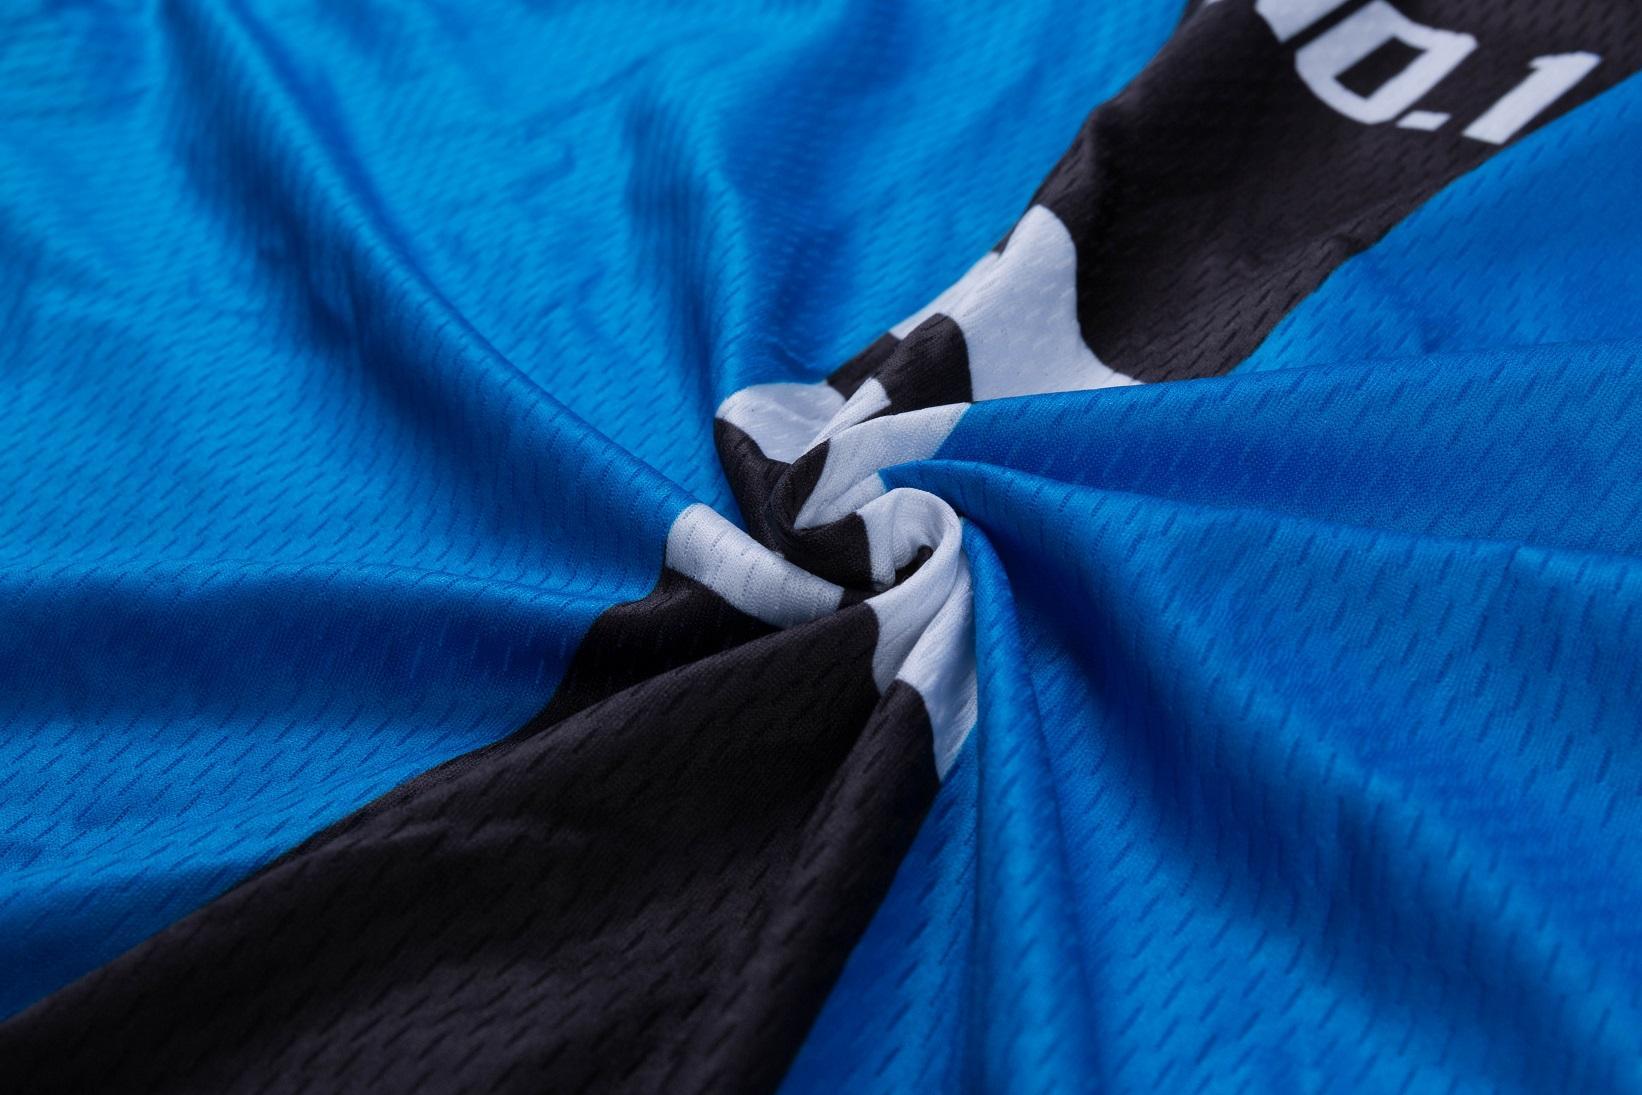 Venda quente Barato Preço Tenue Cycliste Homme Conjuntos de Camisa de Ciclismo Bib Shorts Terno Bretelle Ciclismo MTB Roupas de Bicicleta de Estrada para o Motociclista